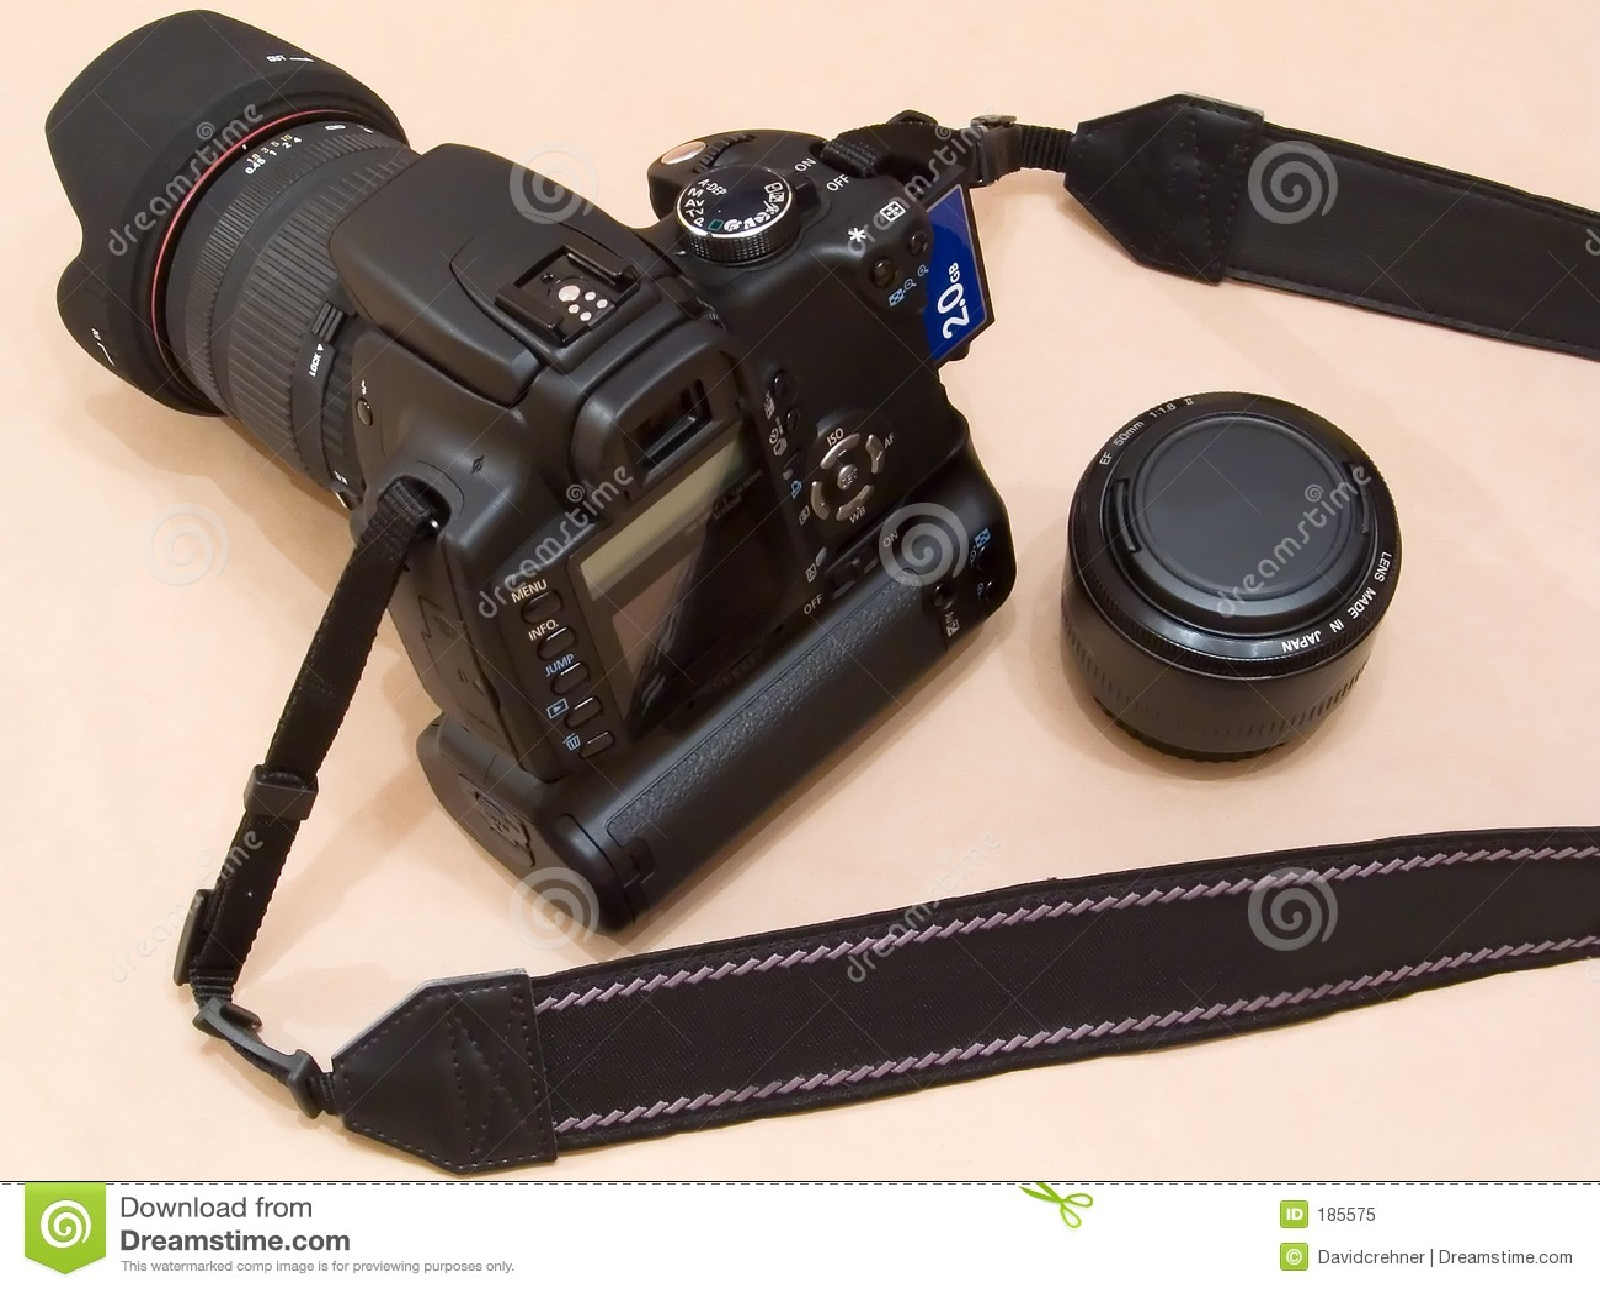 Camera Canon Eos 350d Dslr Camera canon eos 350d digital rebel dslr camera unbranded royalty free unbranded